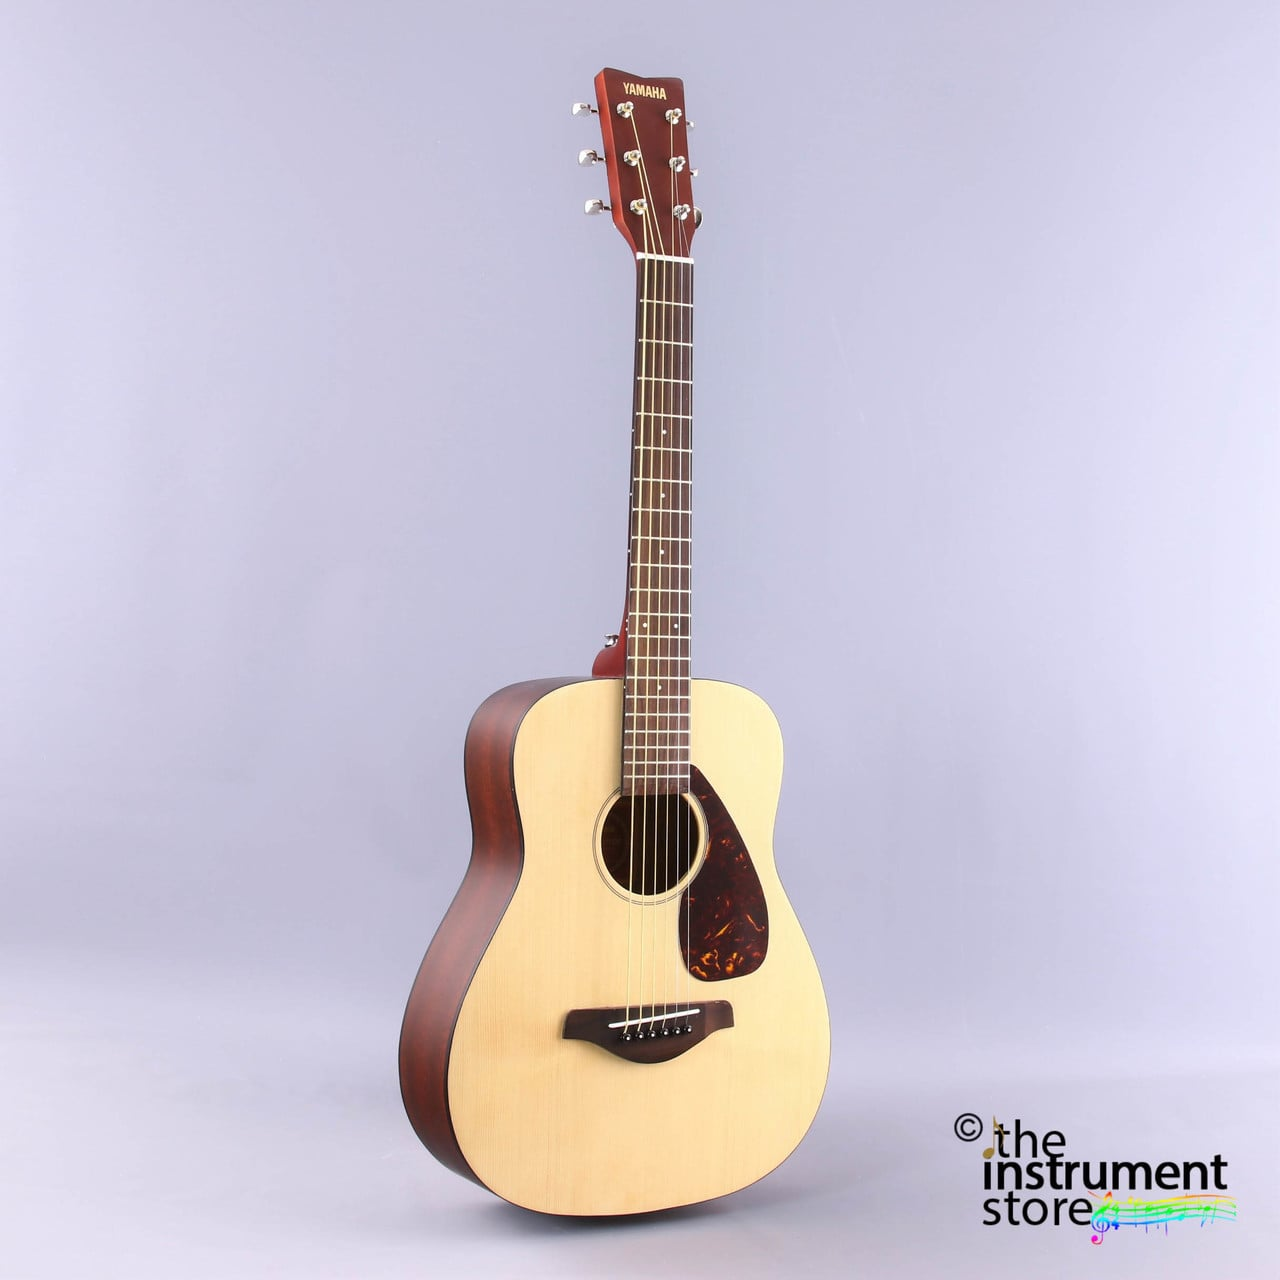 Yamaha jr2 3 4 size acoustic guitar with gig bag reverb for Yamaha jr2 3 4